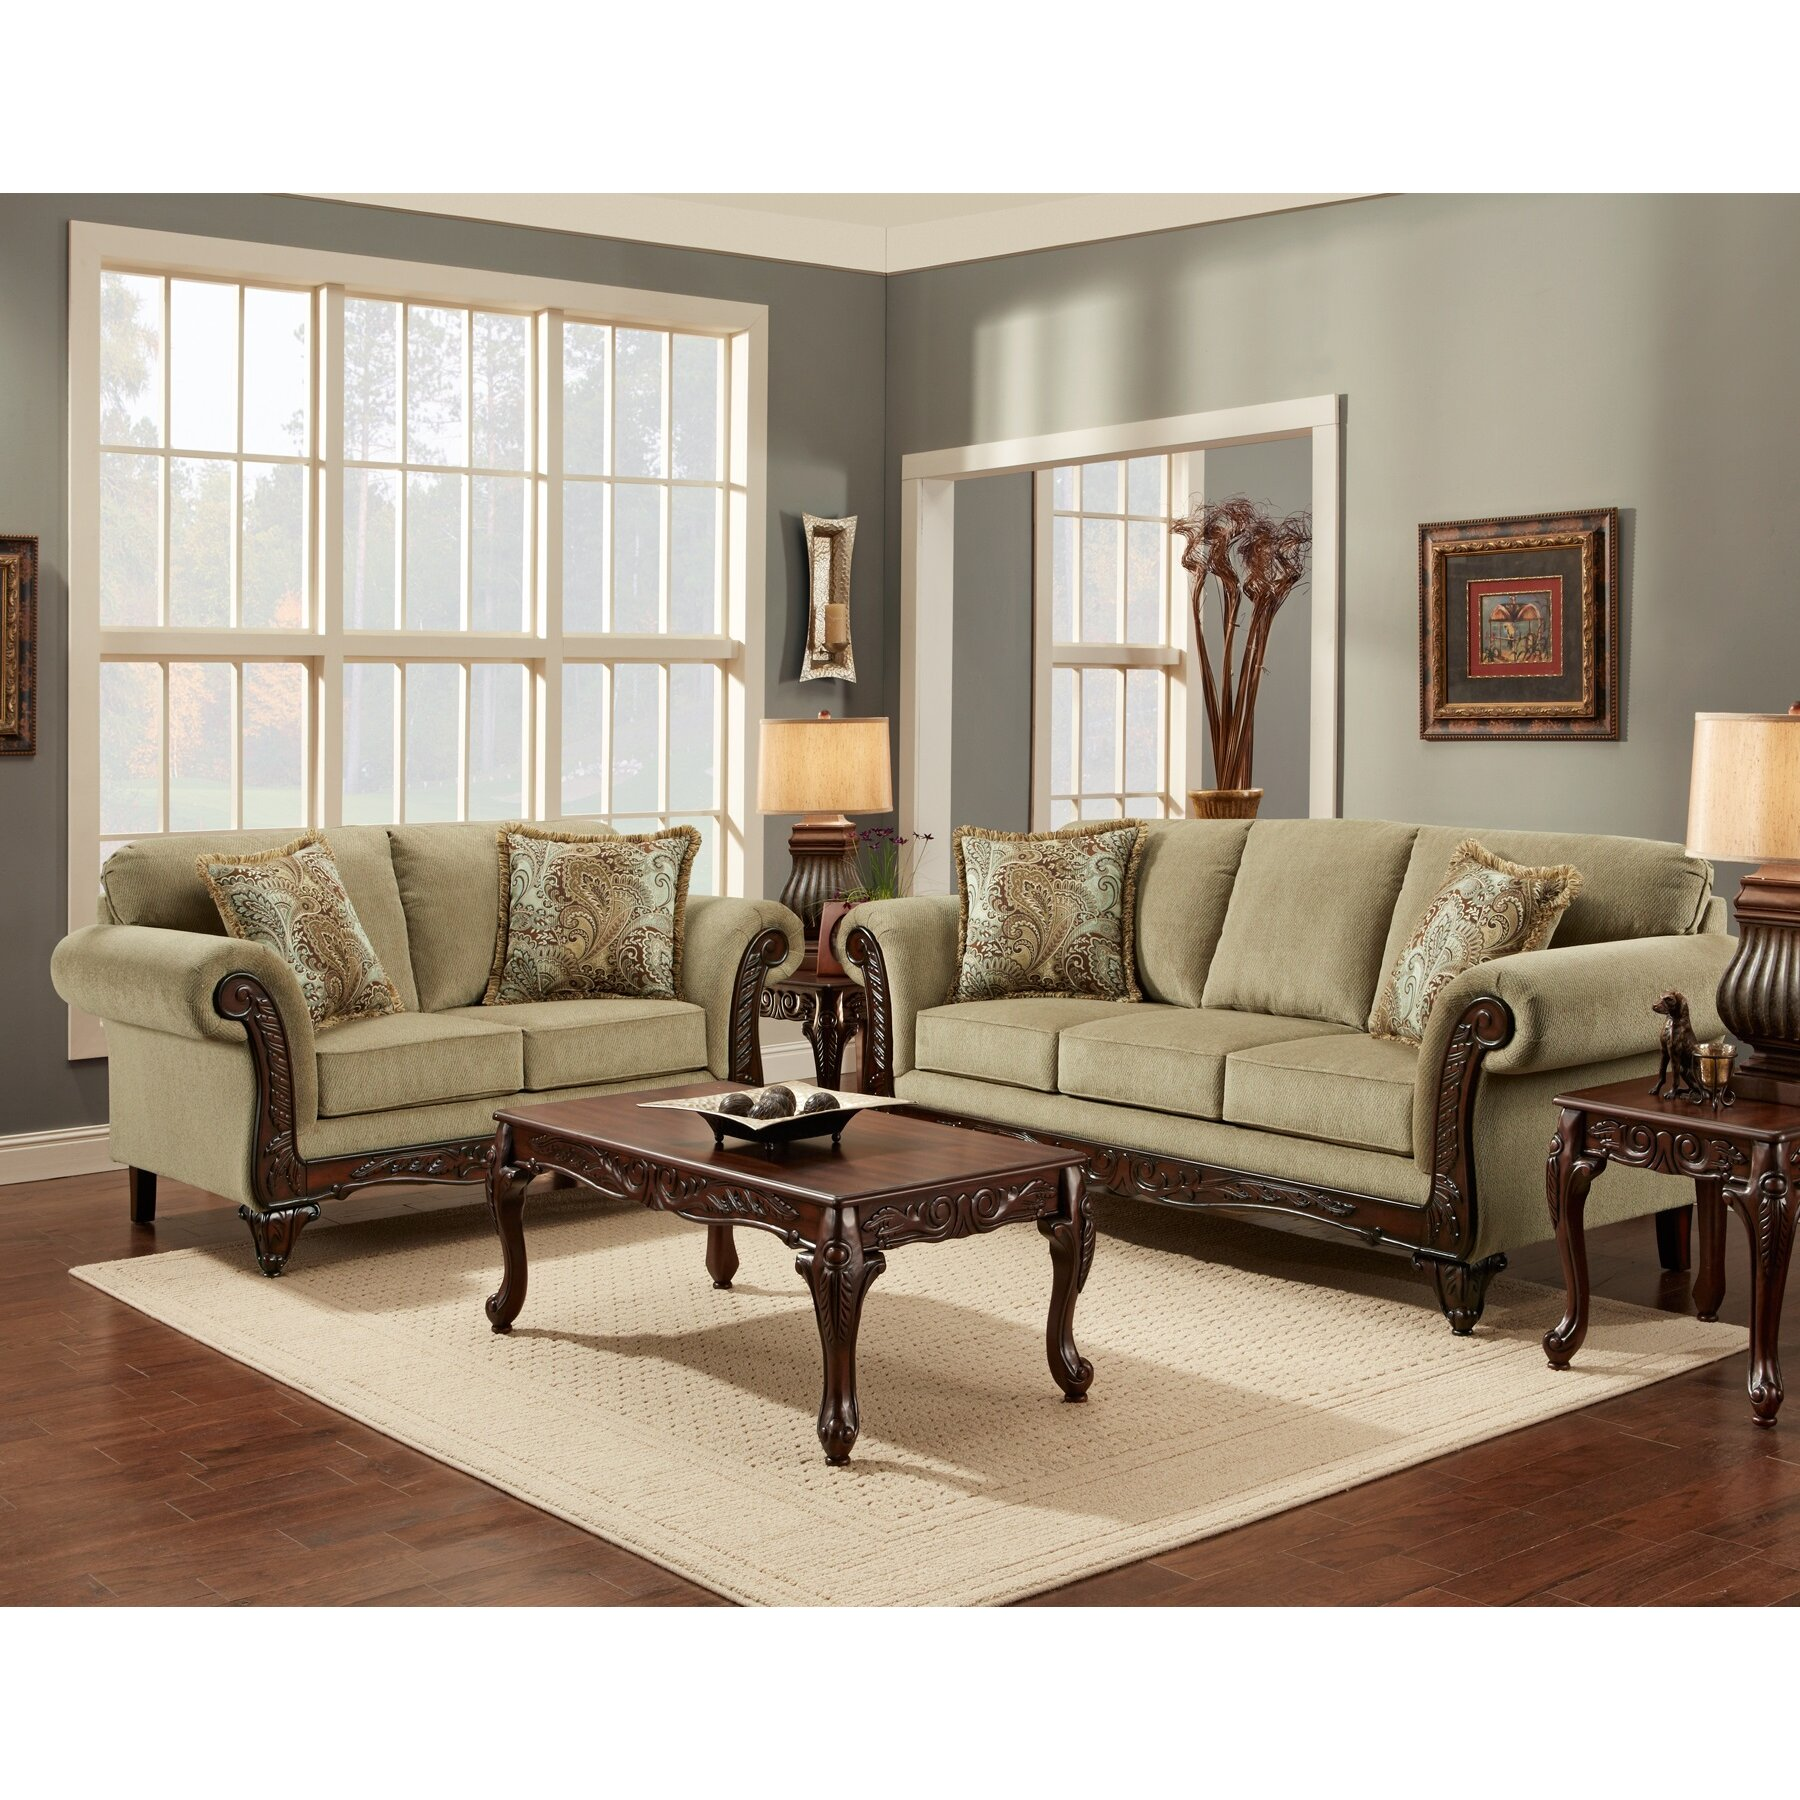 Astoria Grand Liddington Living Room Collection Reviews Wayfair